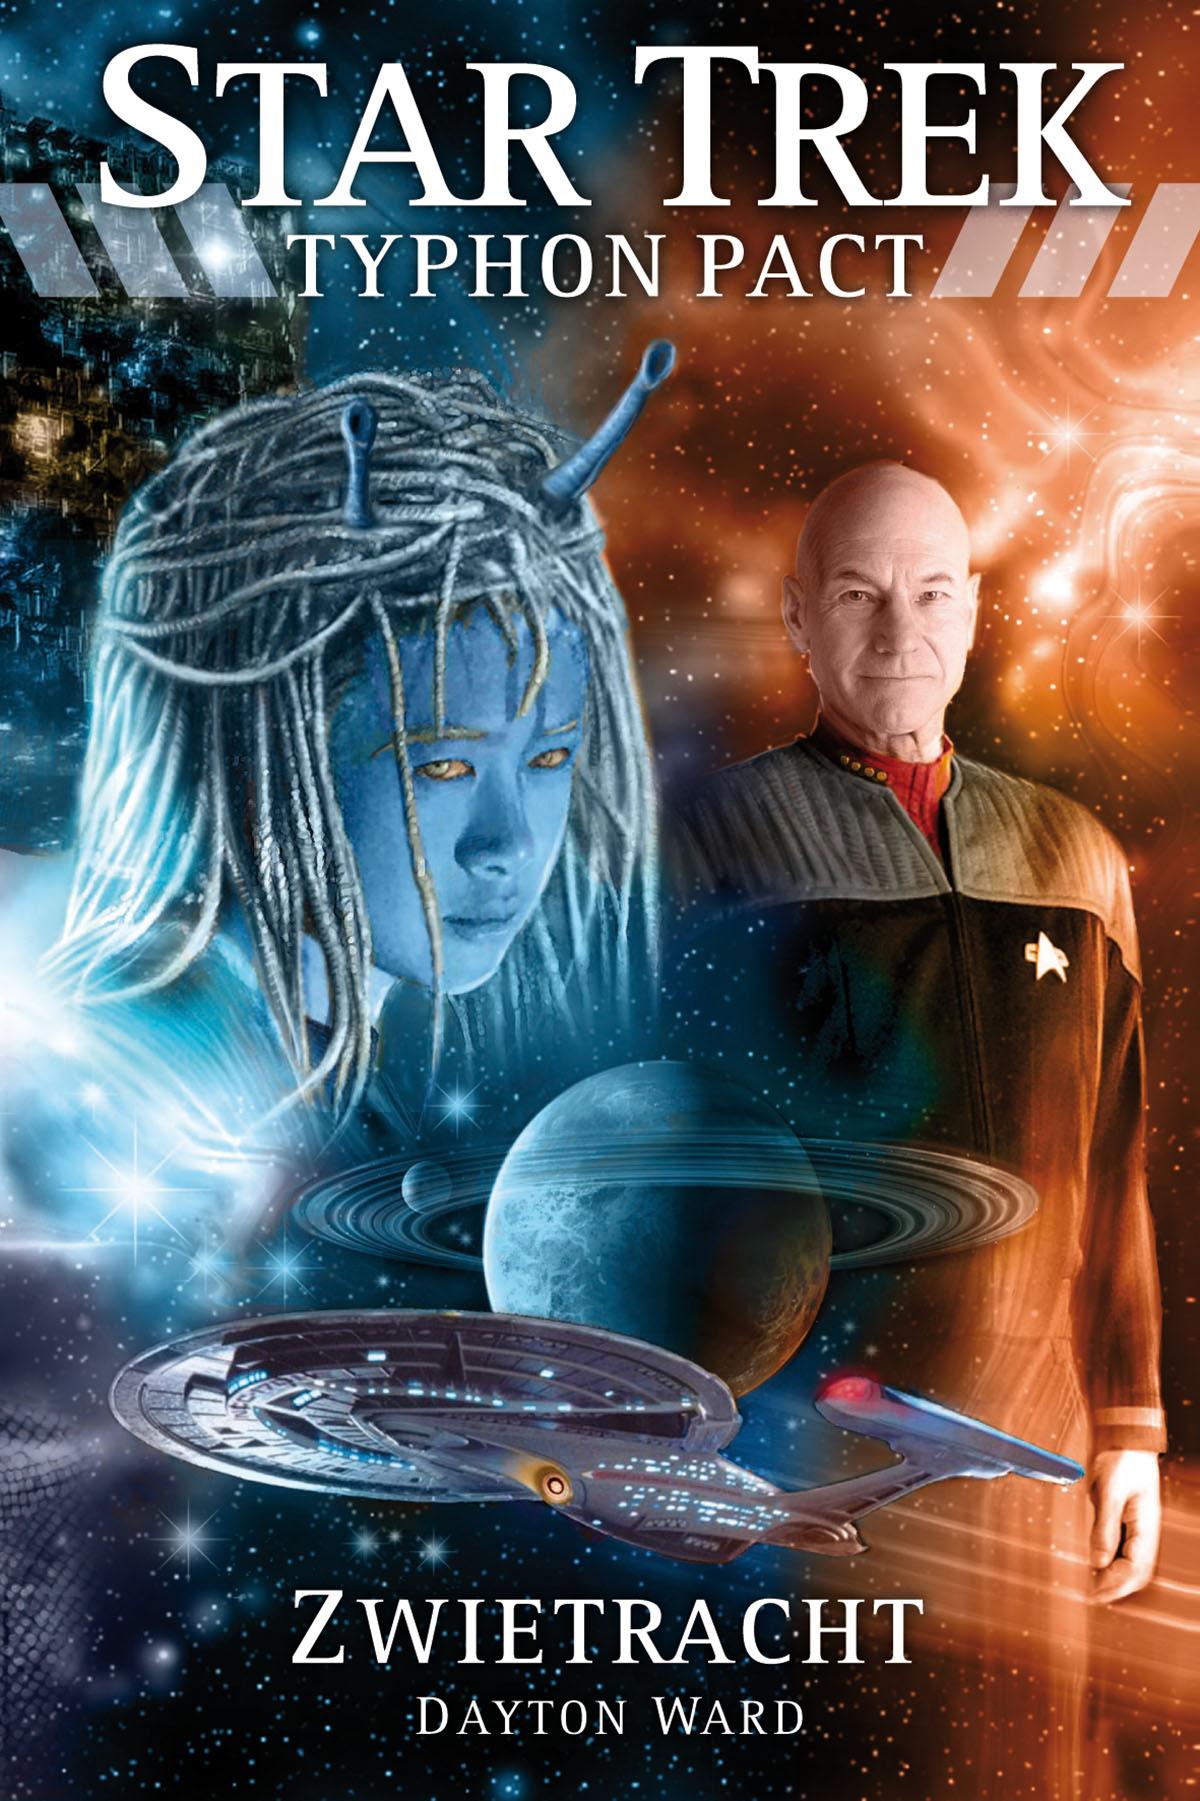 Dayton Ward Star Trek - Typhon Pact 4: Zwietracht david r iii george star trek typhon pact plagues of night